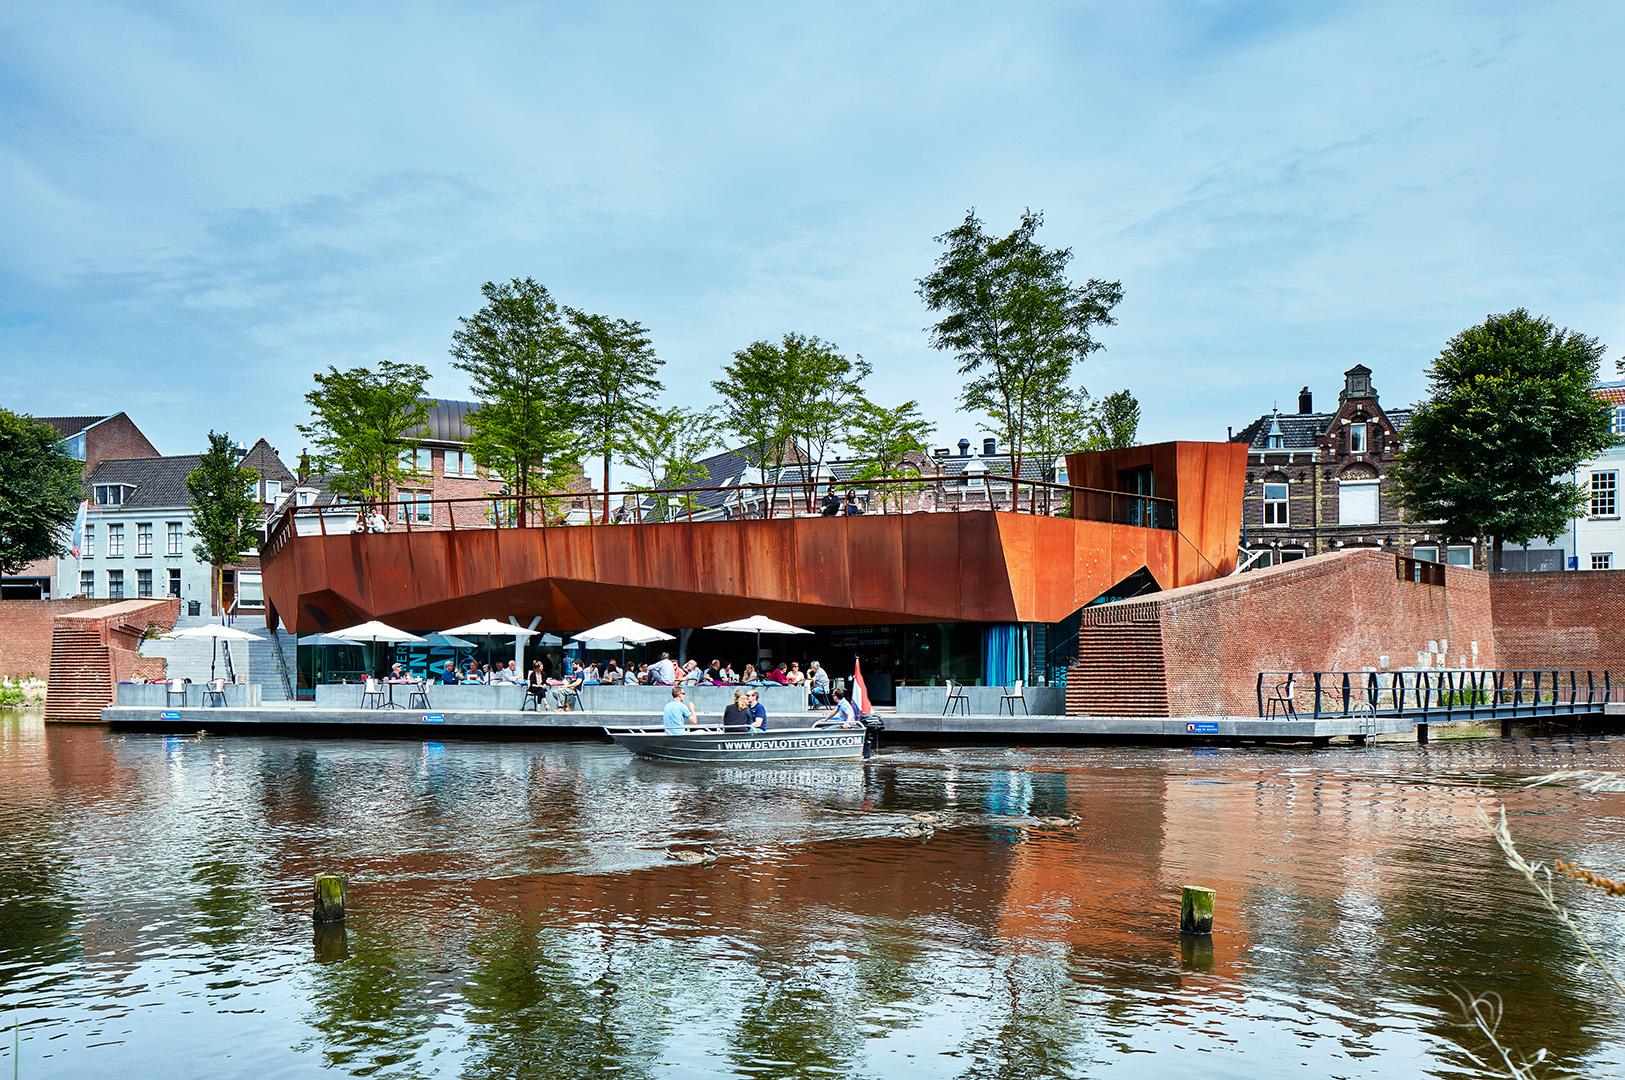 Bolwerk 's-Hertogenbosch, Netherlands